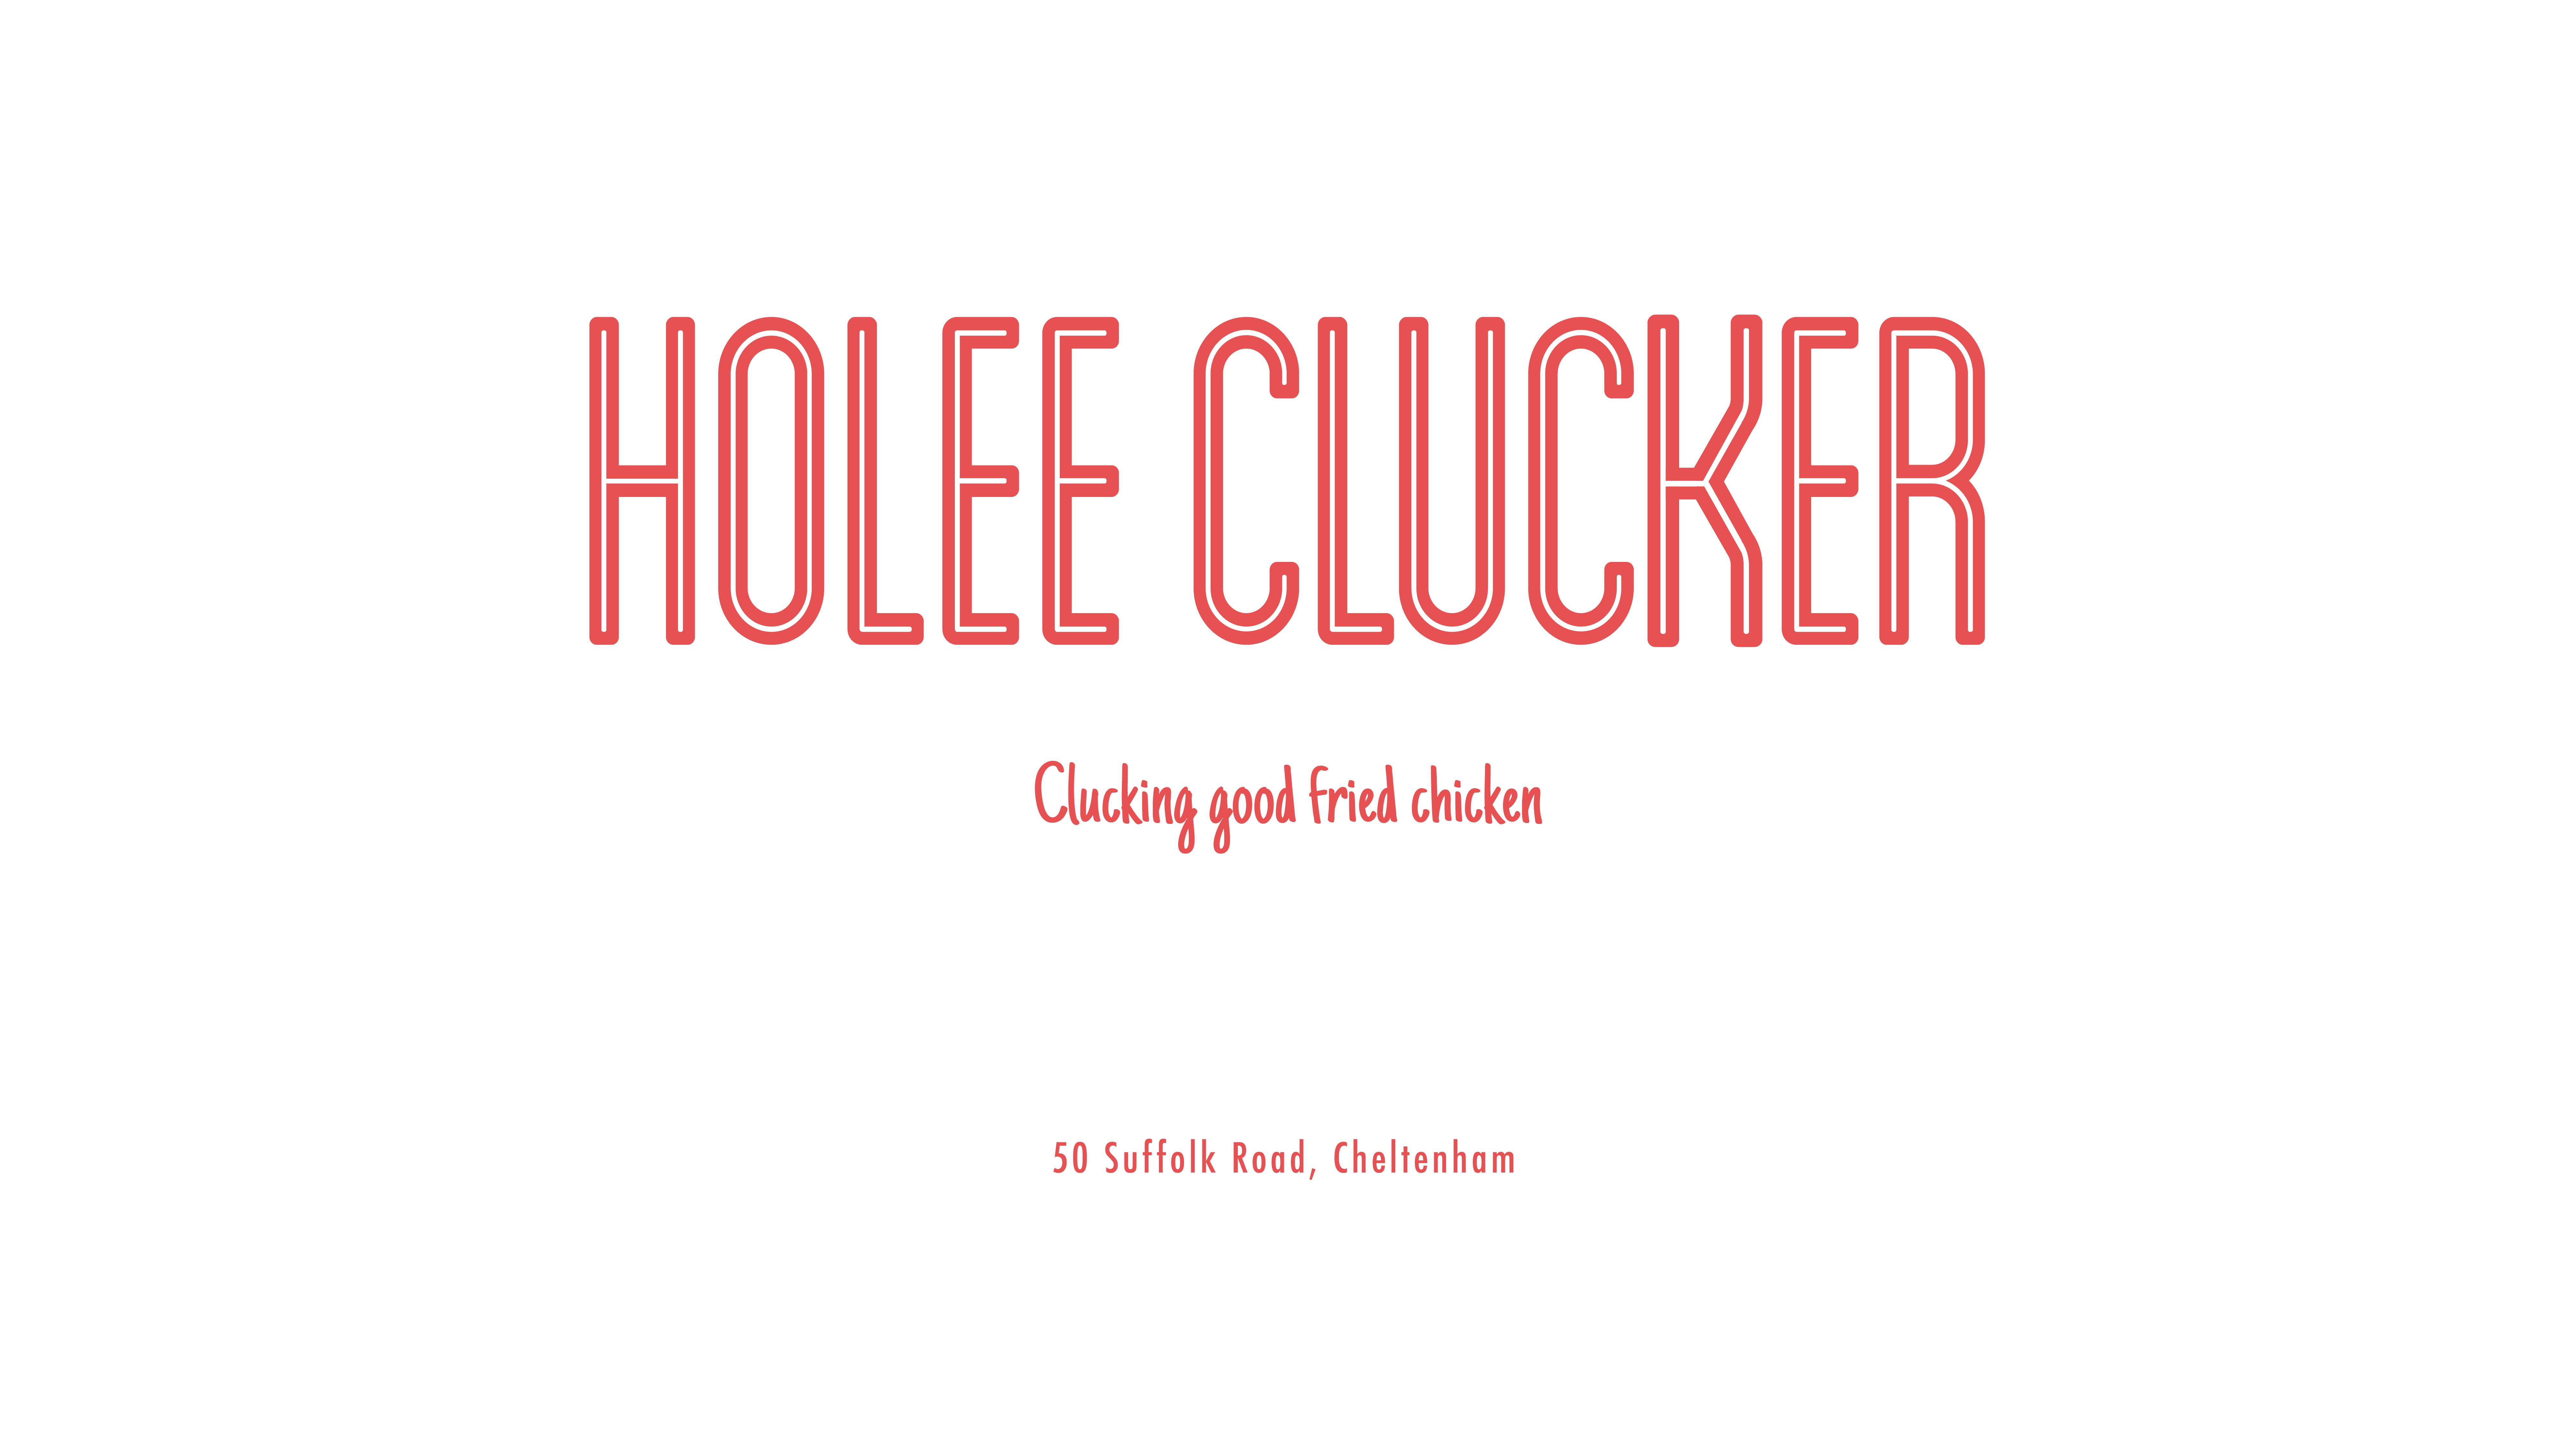 CLUCKER WEB HOLDING